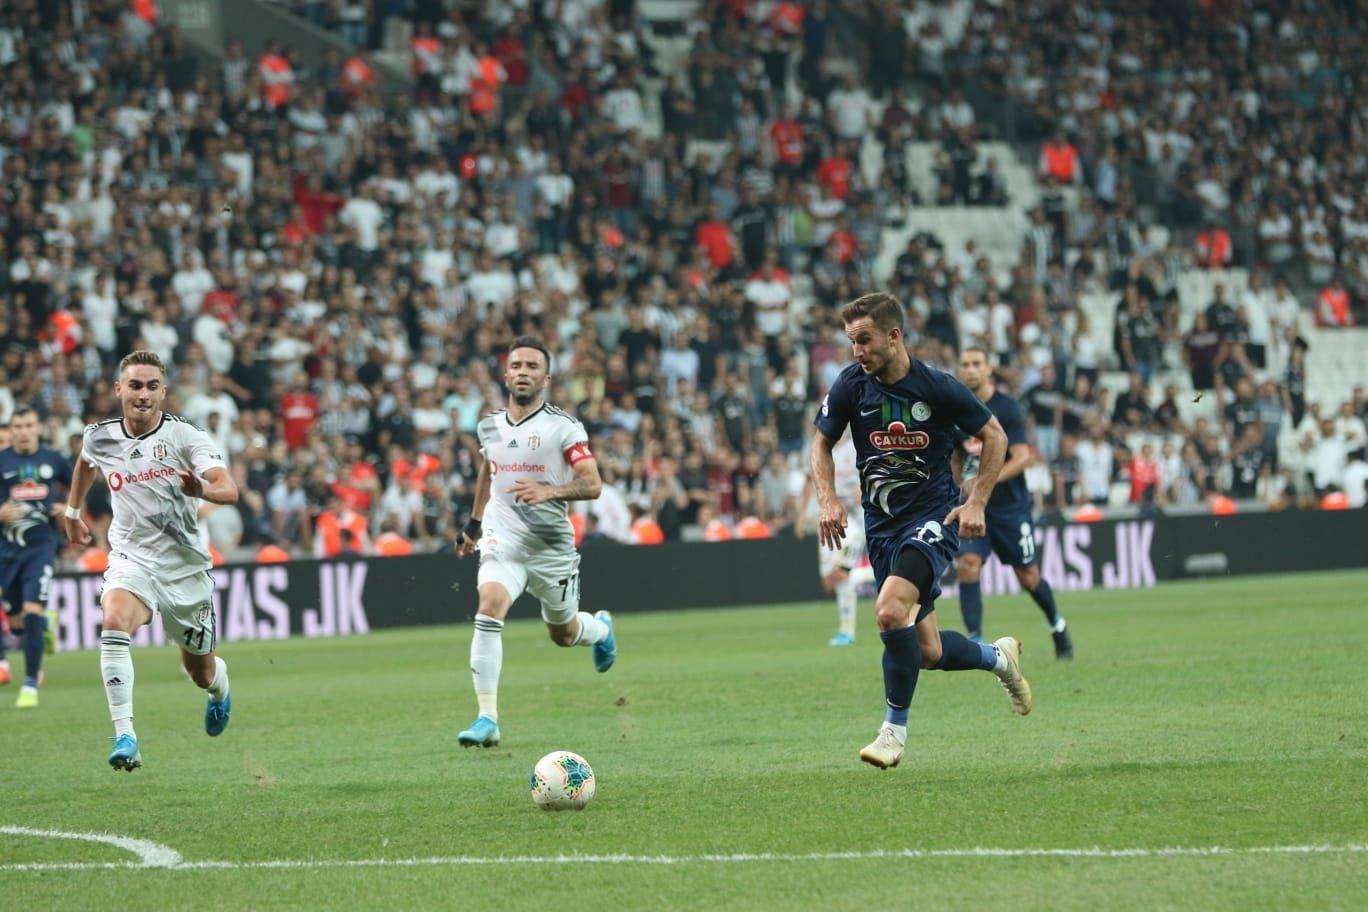 <h2>Beşiktaş - Rizespor: 30.427</h2>